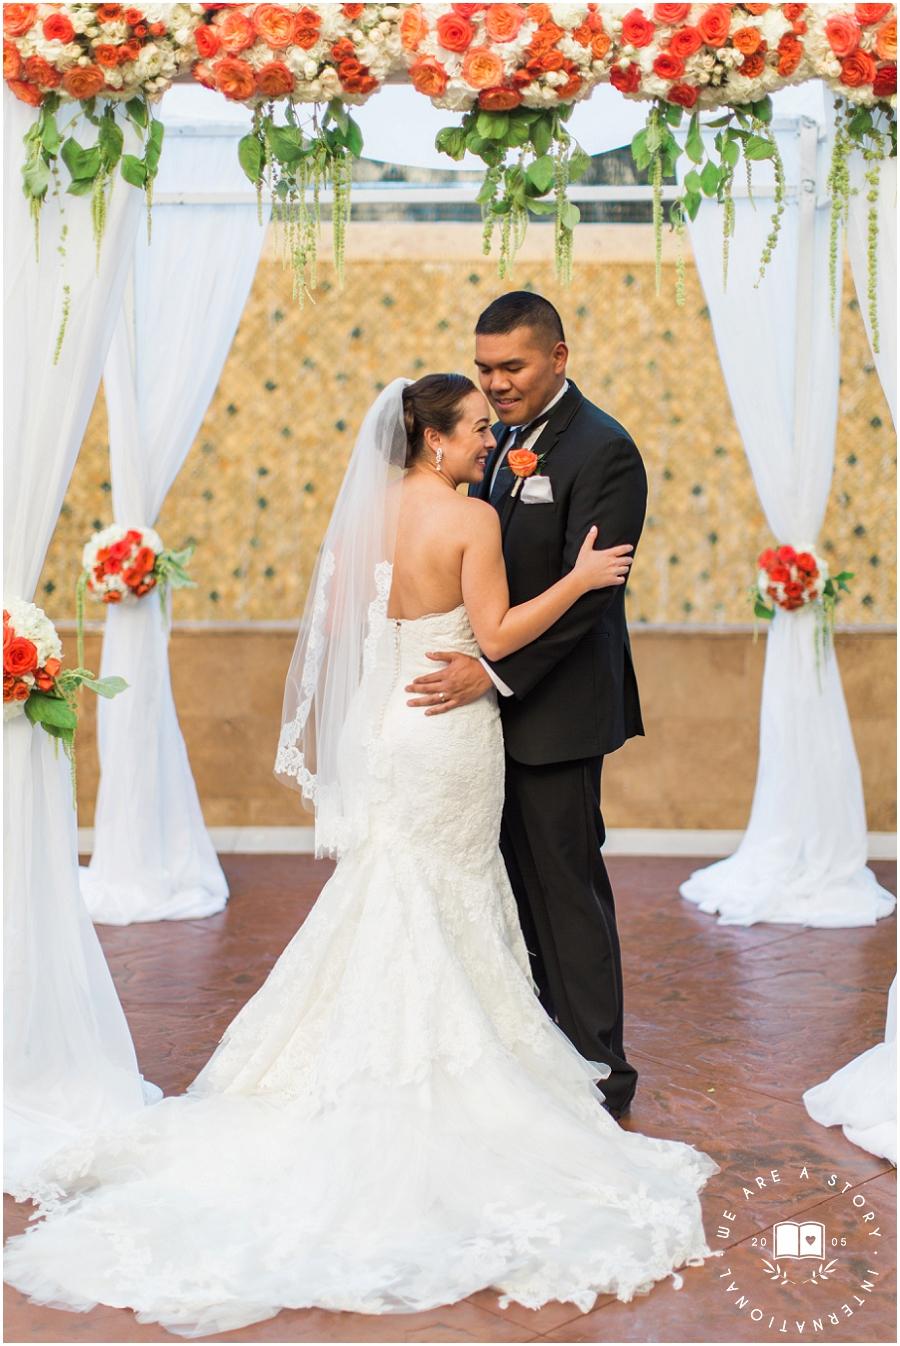 Four Seasons wedding photographer Las Vegas _ We Are A Story wedding photographer_2497.jpg